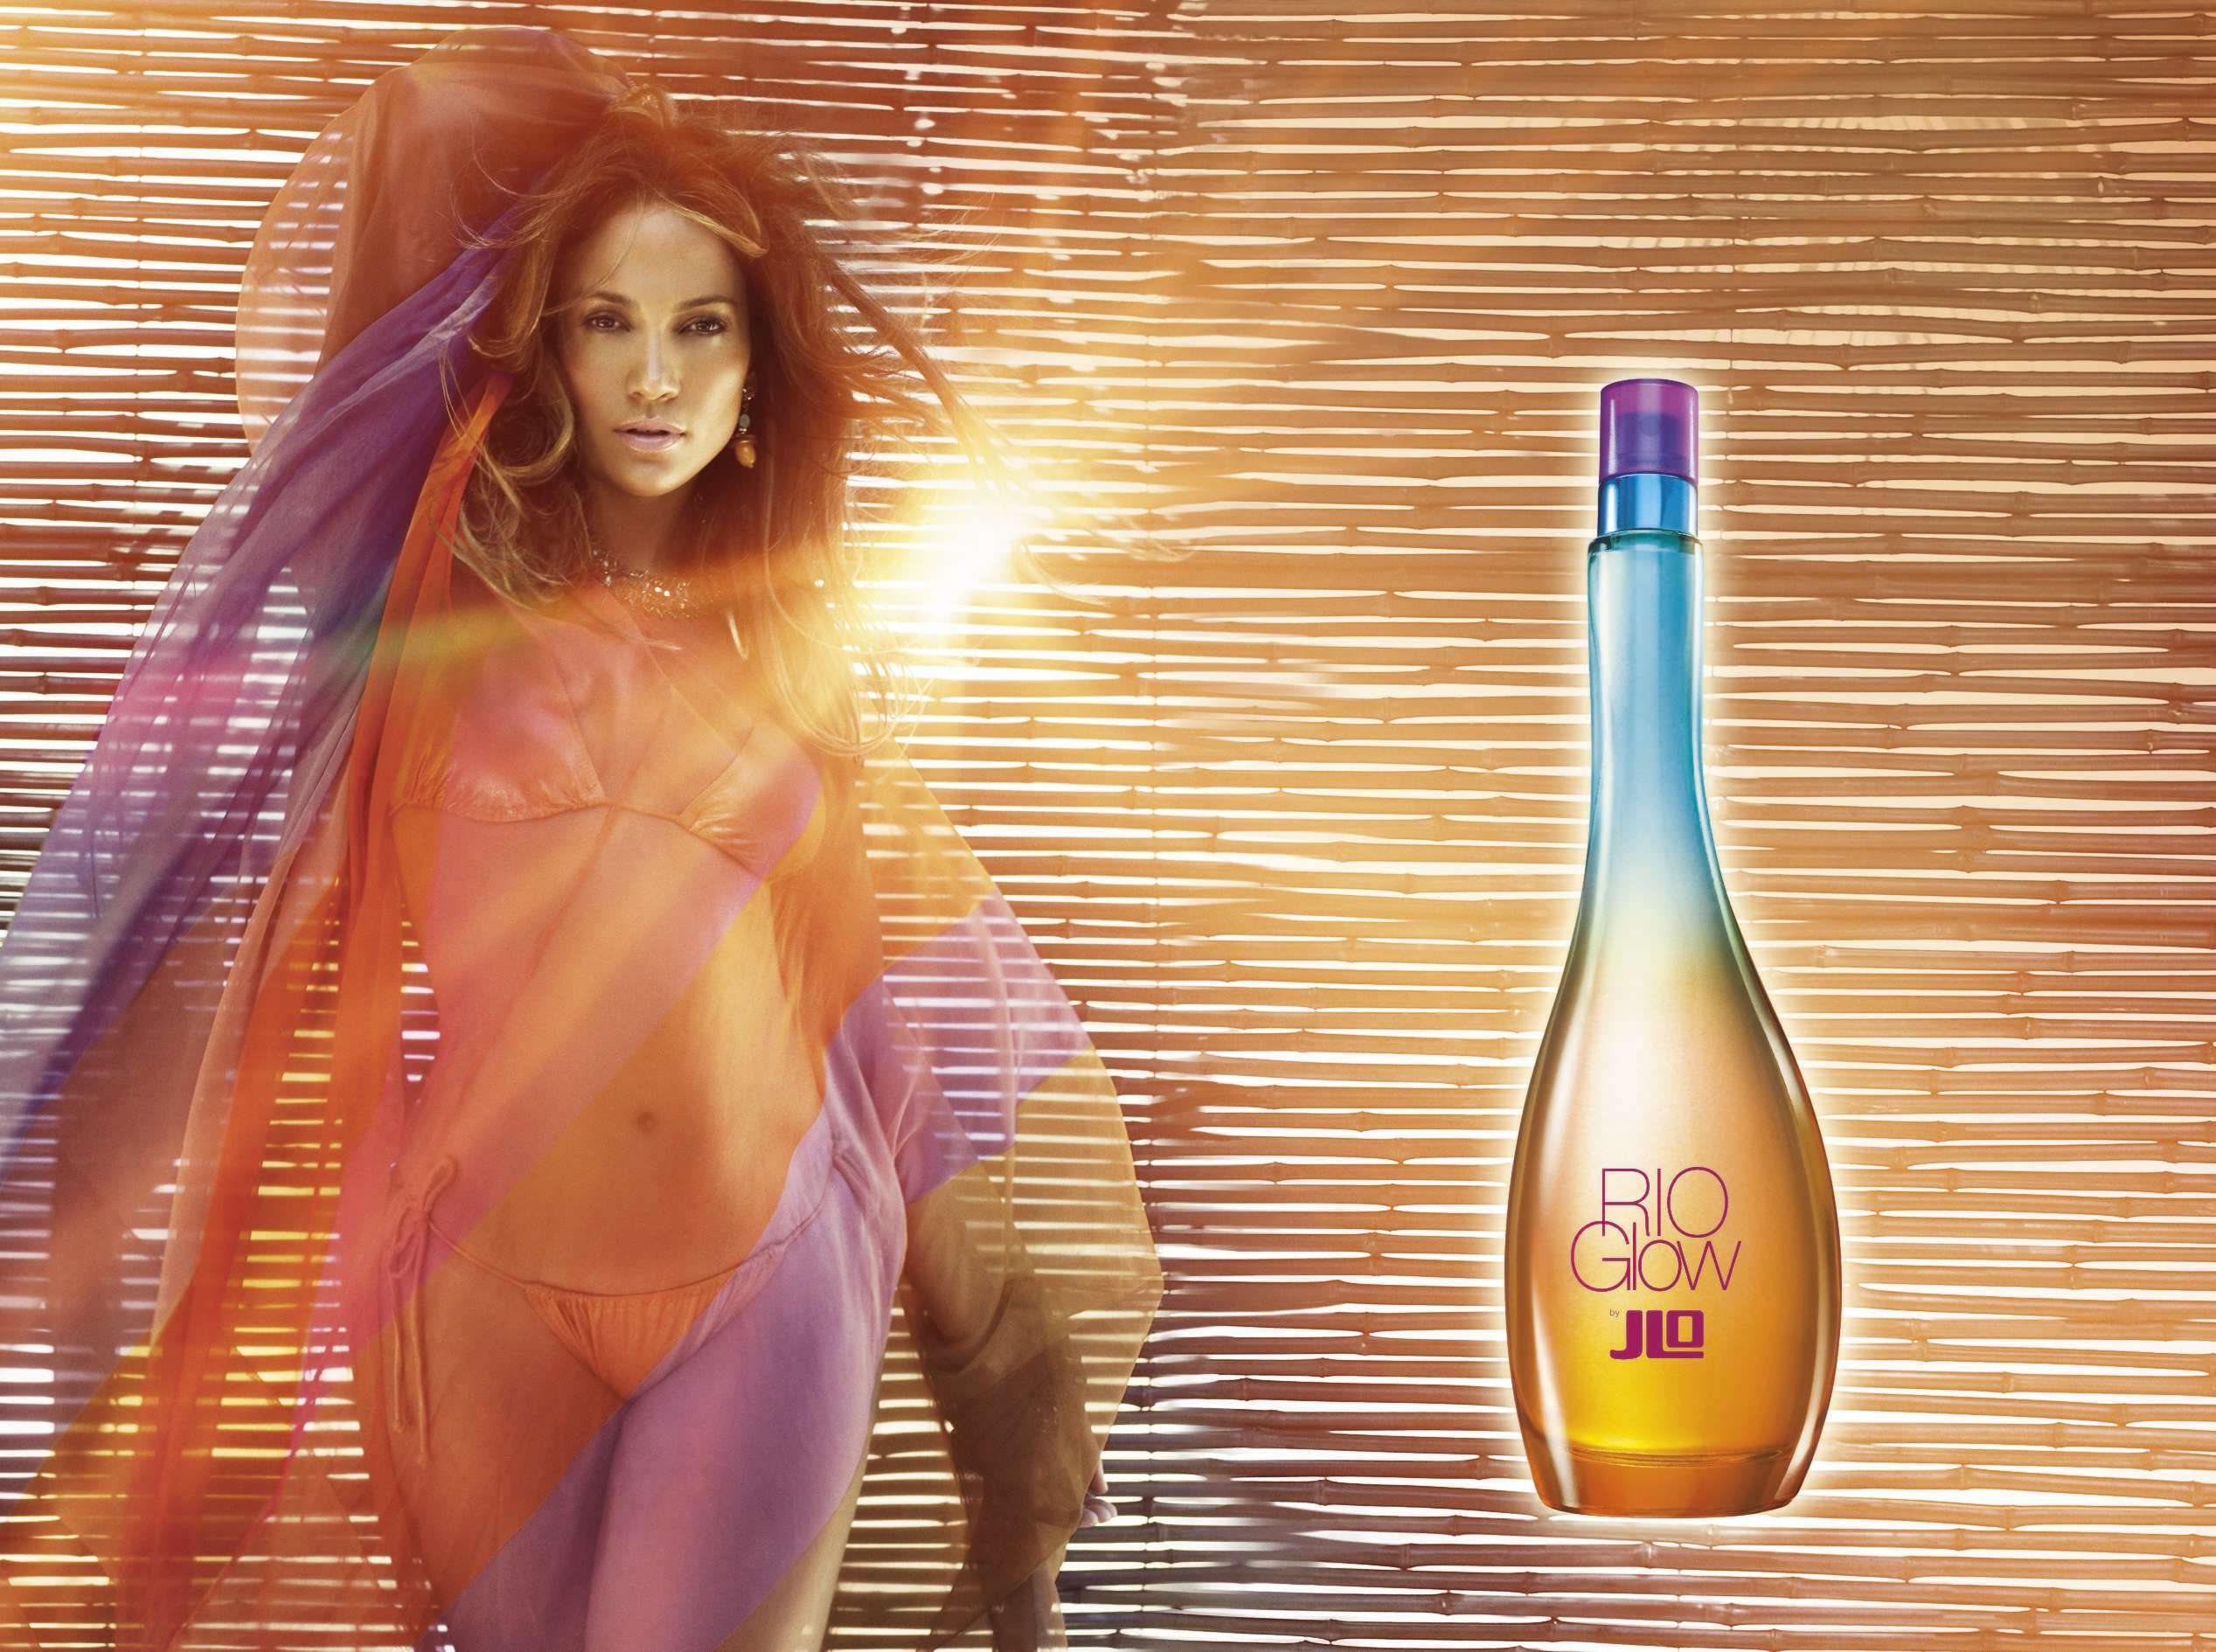 JLO Jennifer Lopez Rio Glow Banner.jpg